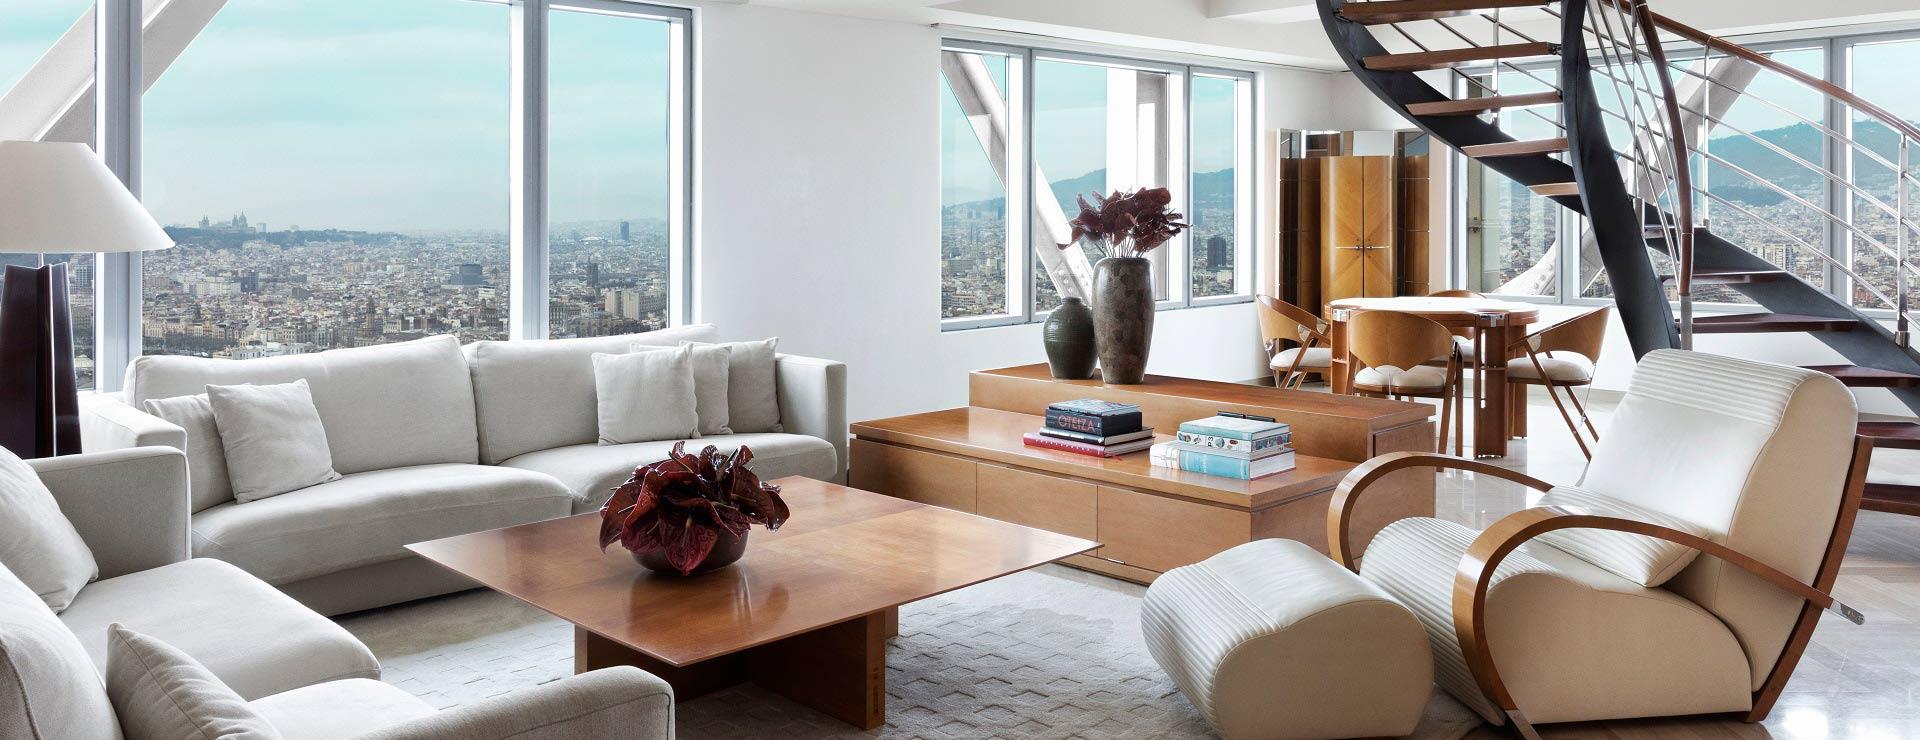 The Barcelona Penthouse